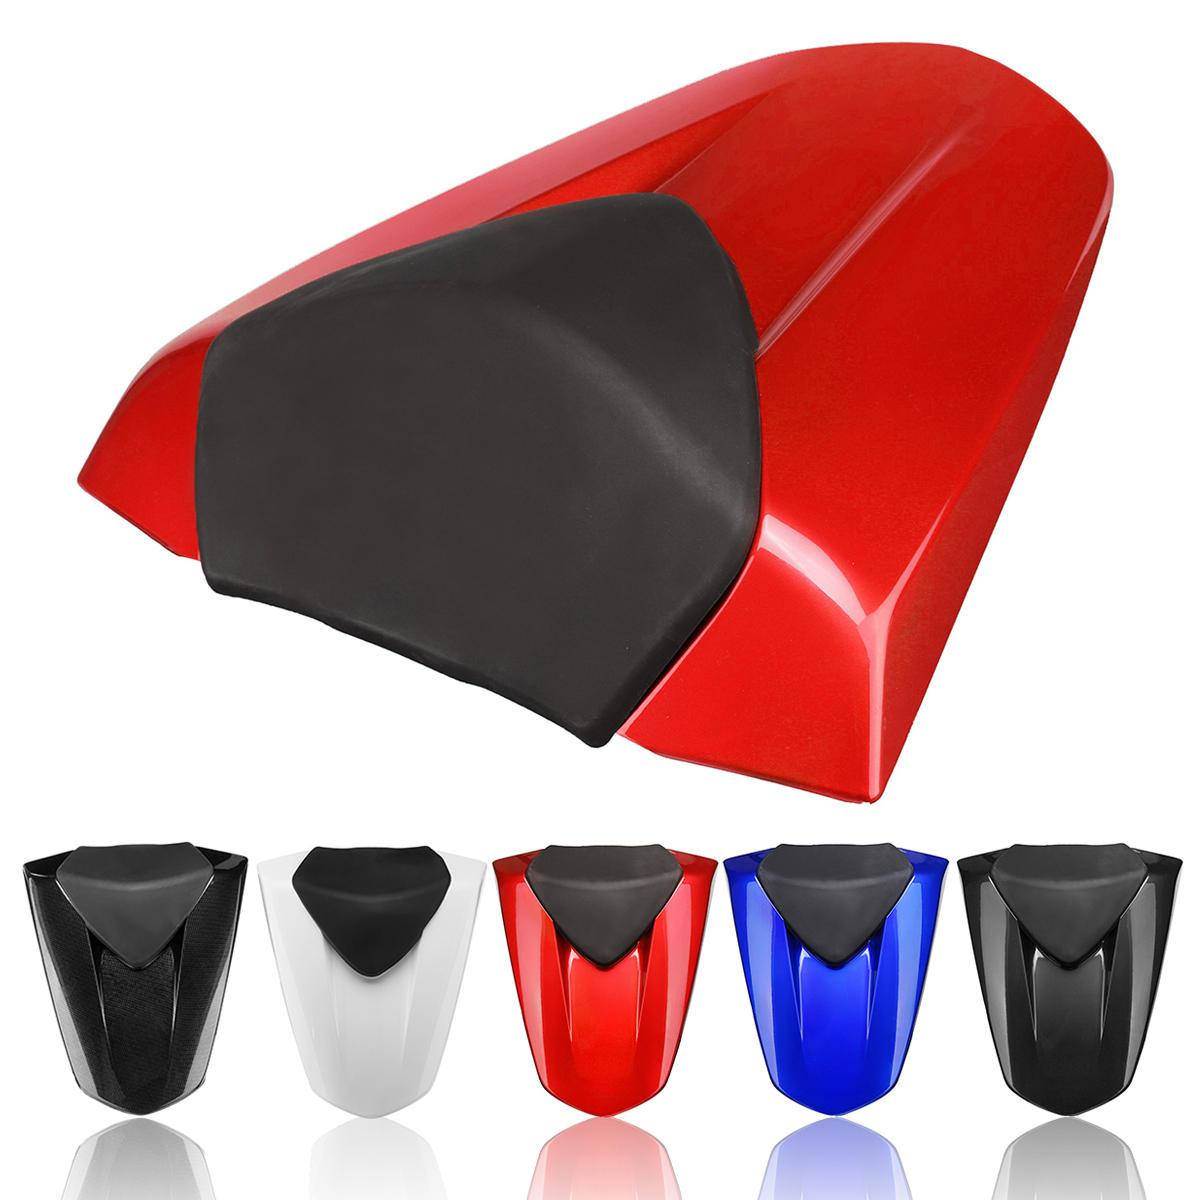 Motorcycle ABS Rear Pillion Seat Cowl Fairing Cover For Honda CBR500R CBR  500R 2013-2015 COD